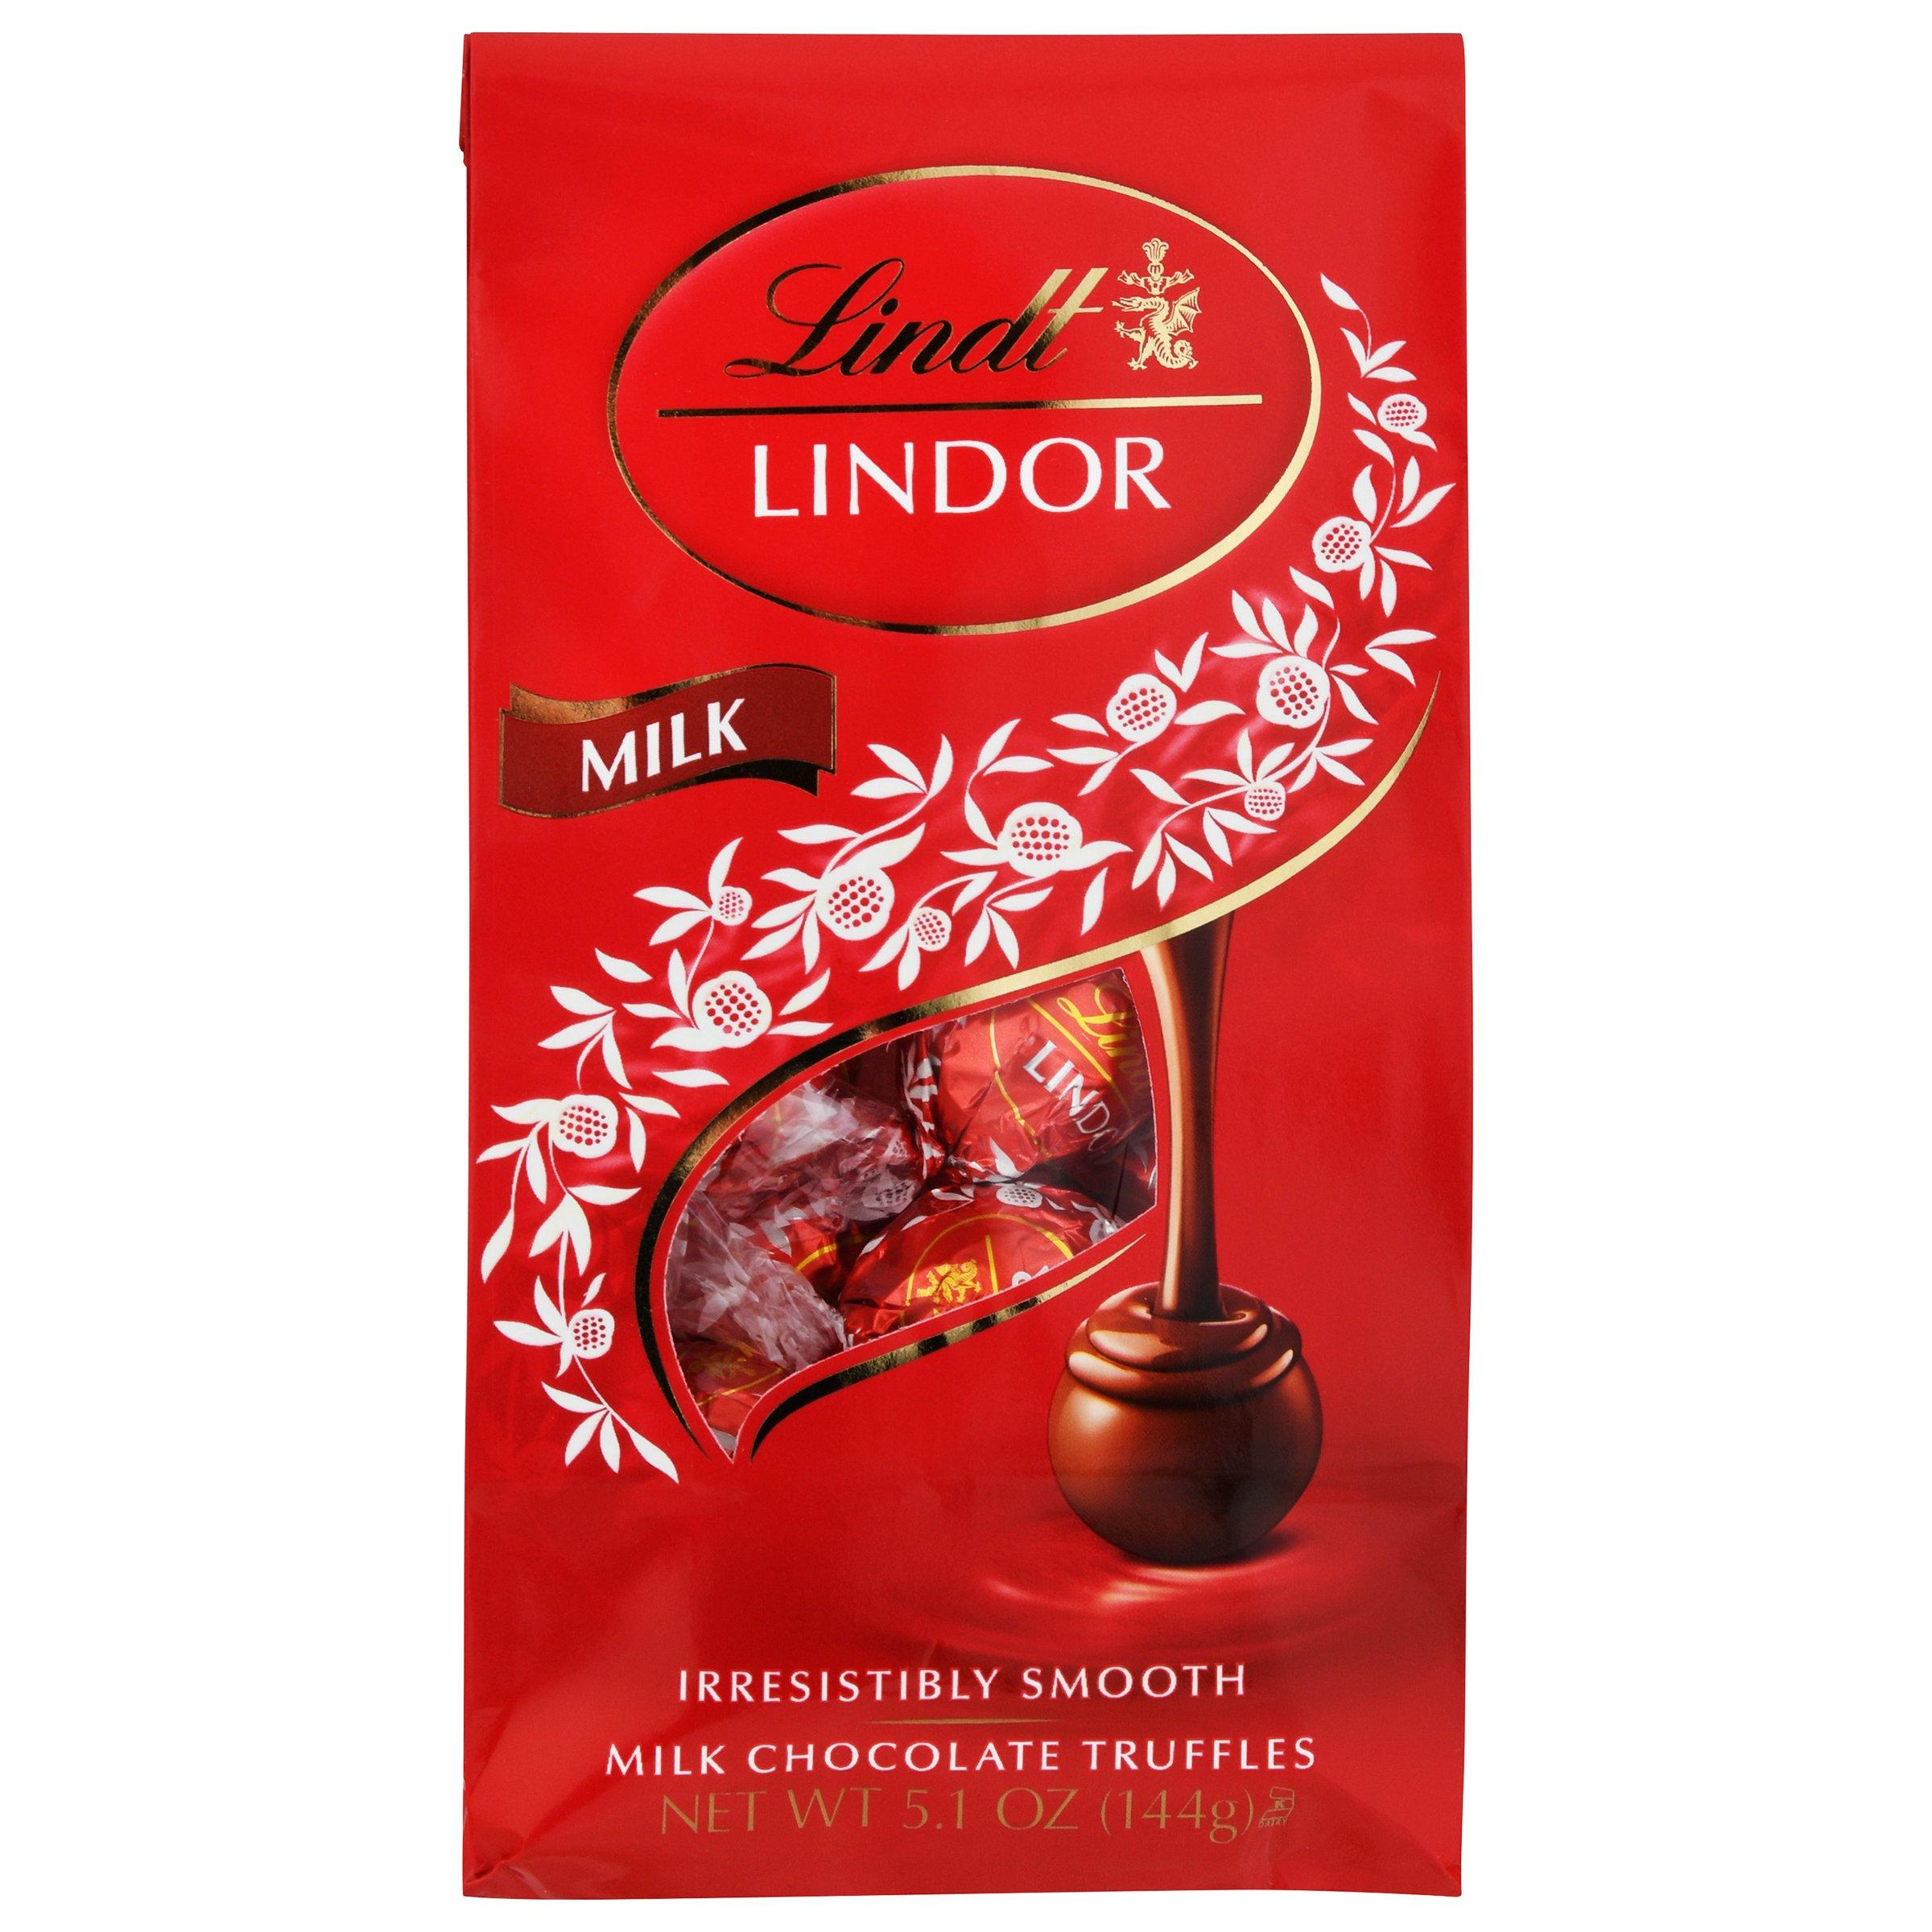 Lindt Lindor Milk Chocolate Truffles ...